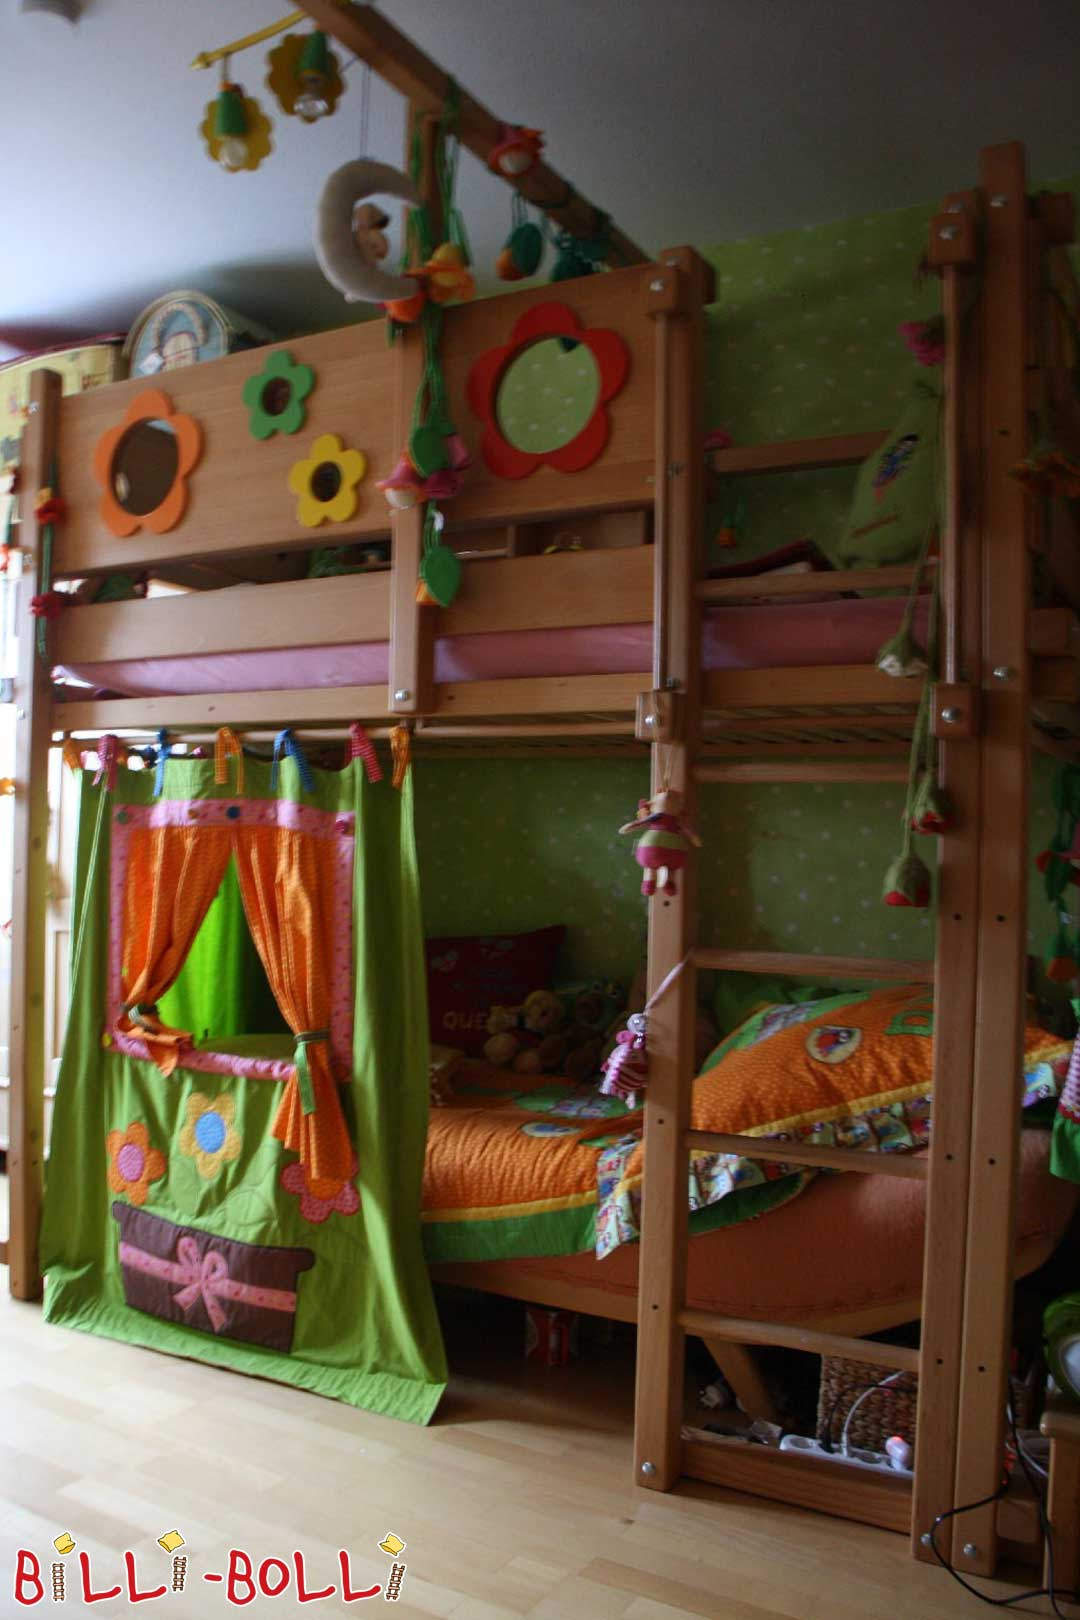 Segunda mano p gina 24 muebles infantiles de billi bolli for Segunda mano muebles infantiles